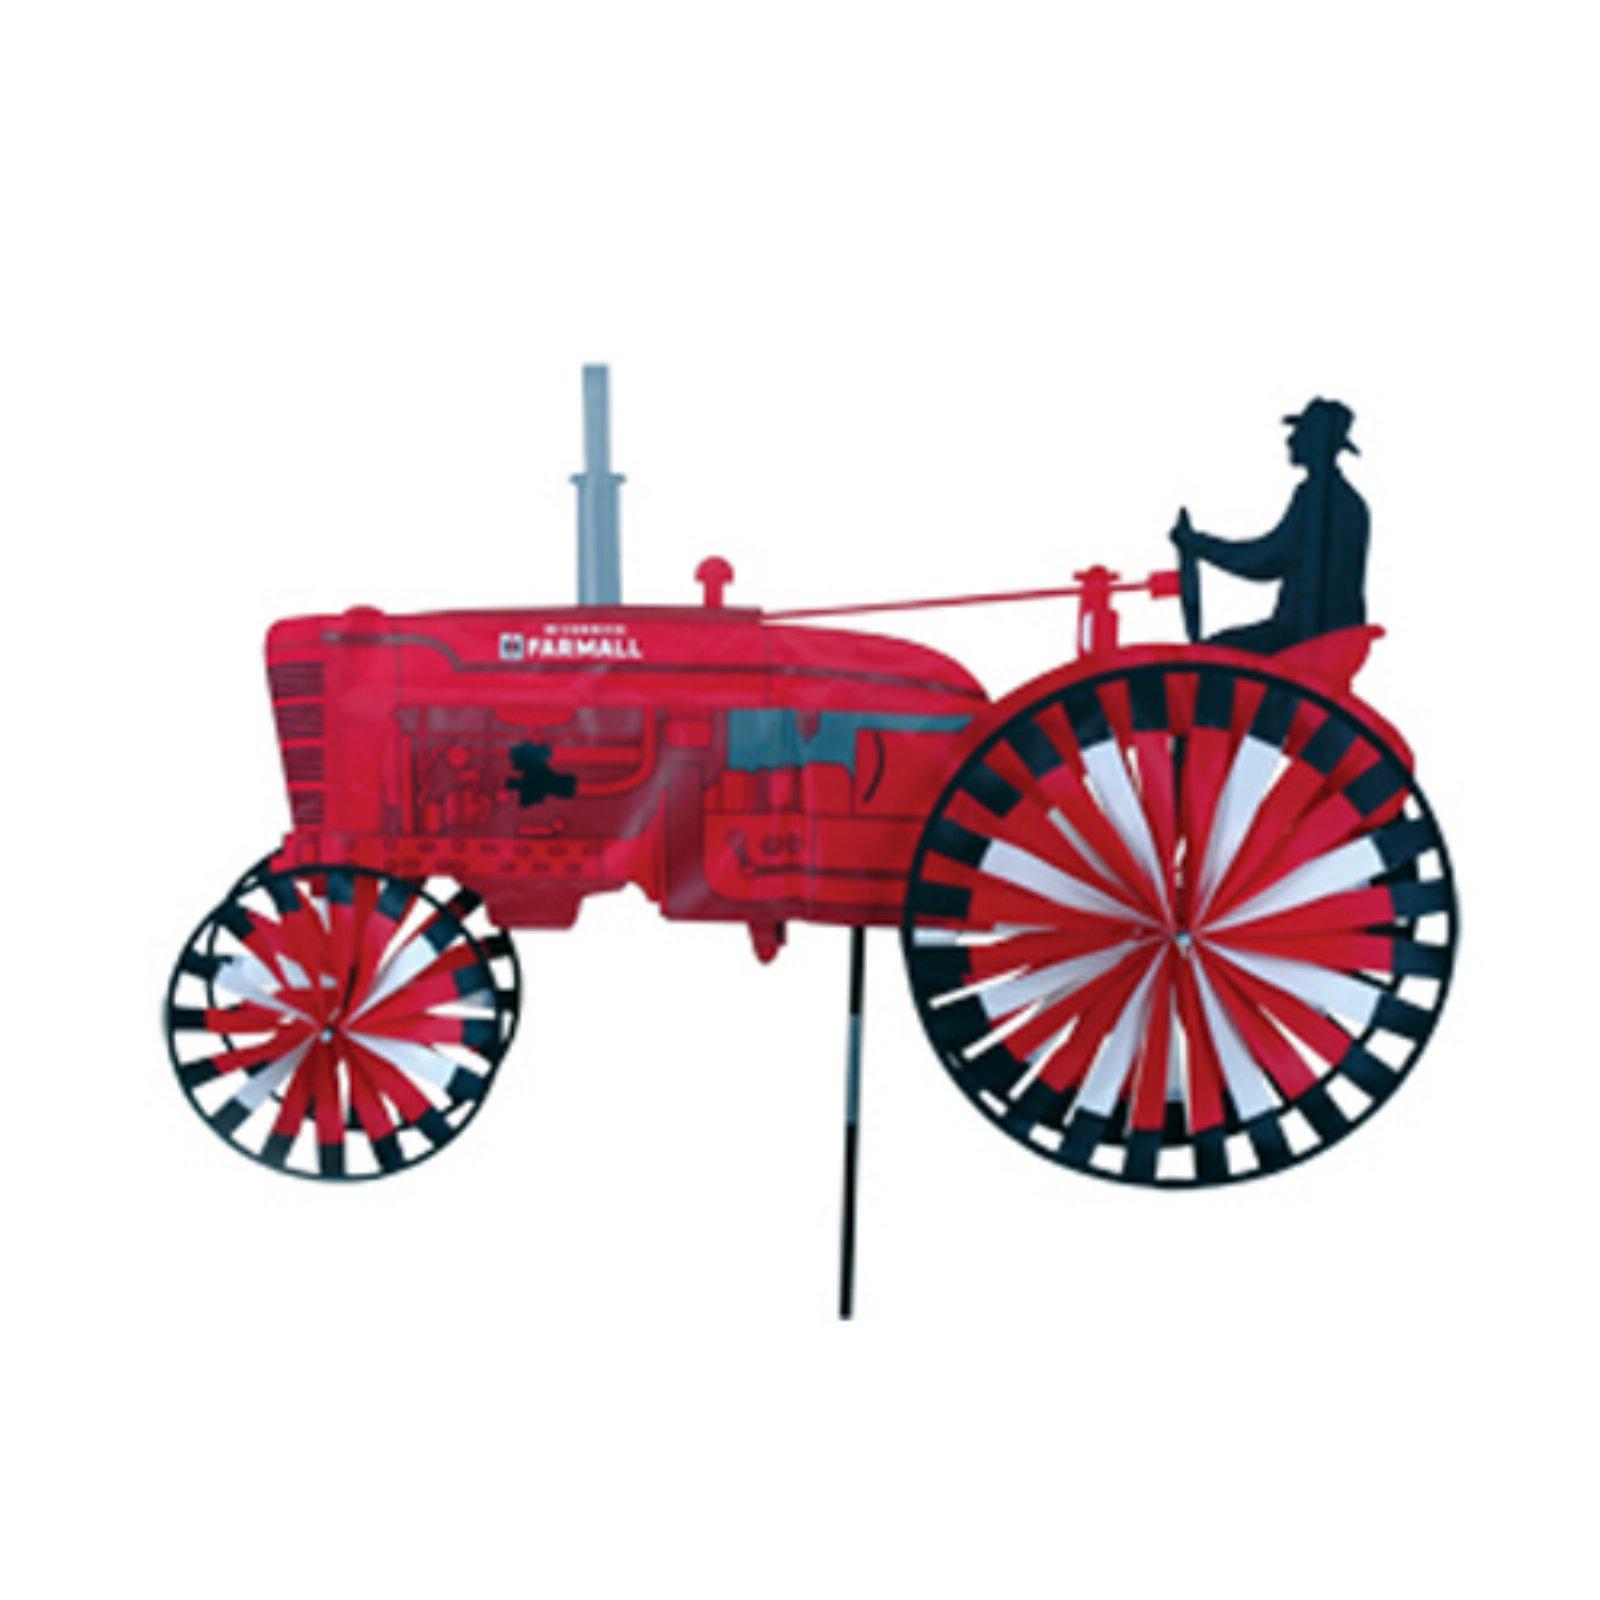 Premier Designs International Harvester Tractor Wind Spinner